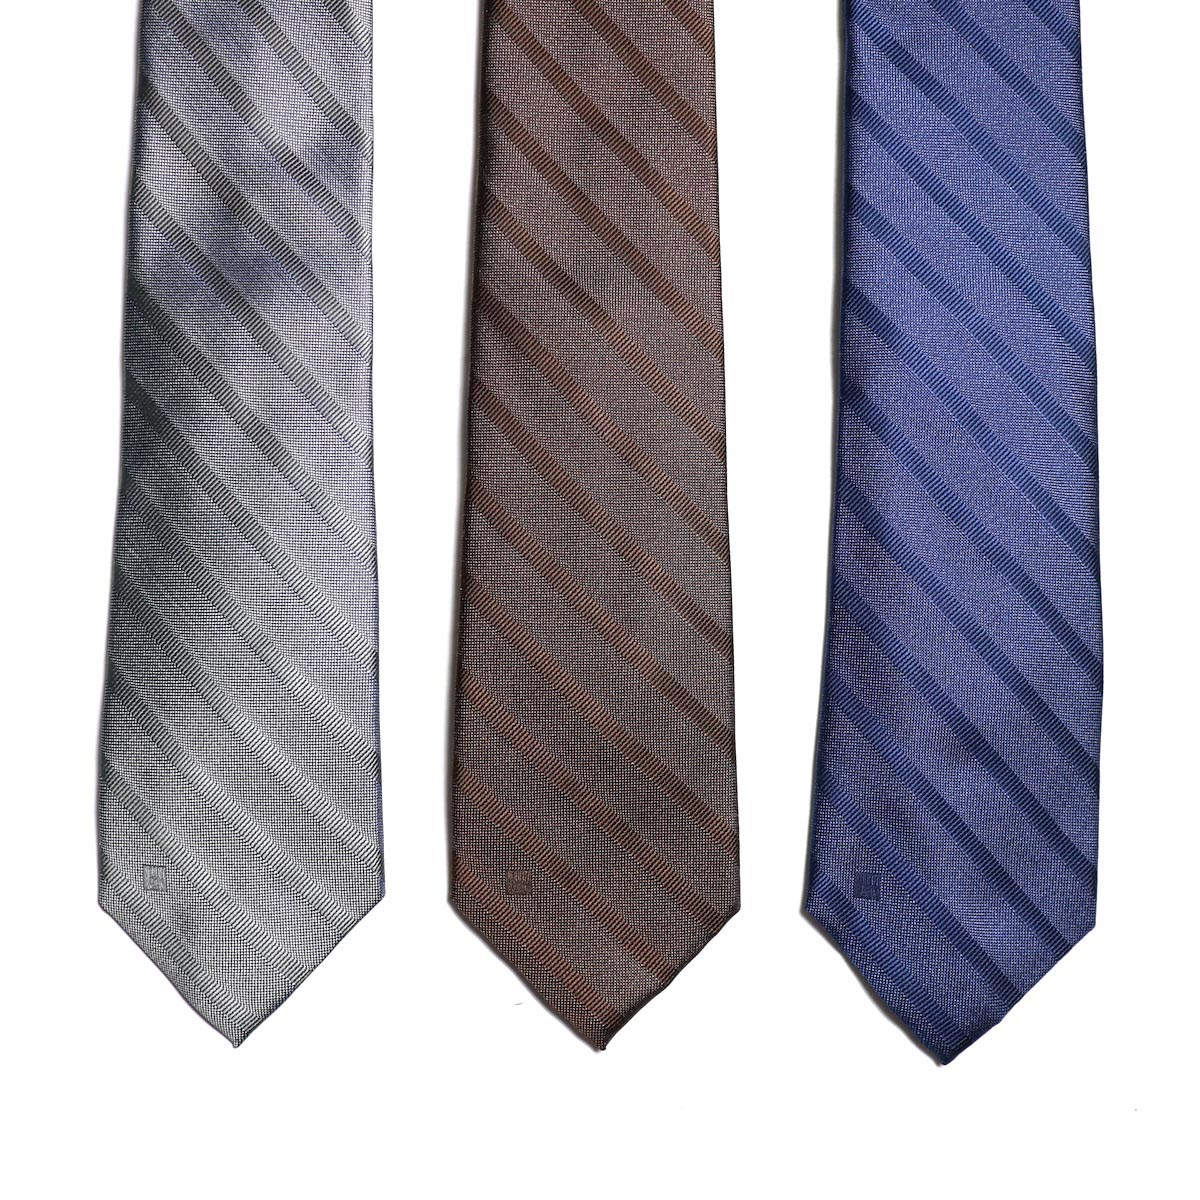 N.HOOLYWOOD / 282-AC01 Regimental tie